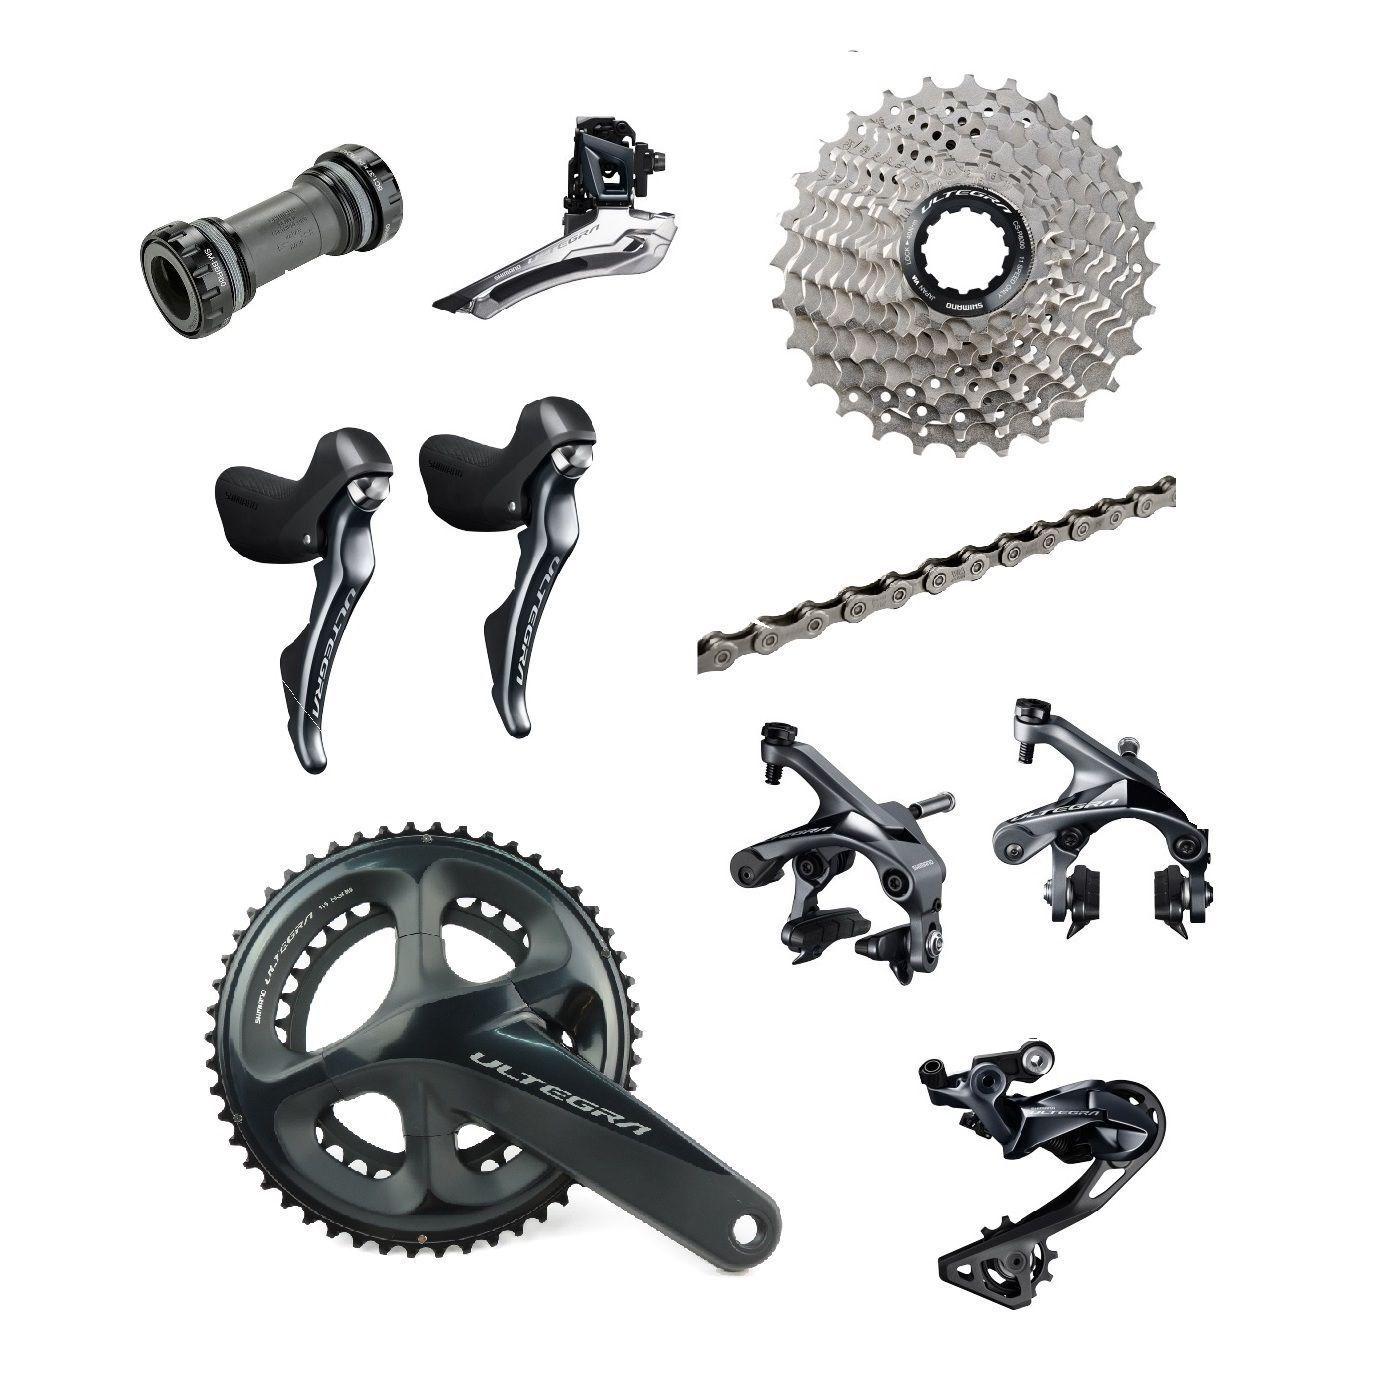 Shimano Ultegra R8000 2 x 11 Speed 50 34T Road Racing Bike Groupset Build Kit